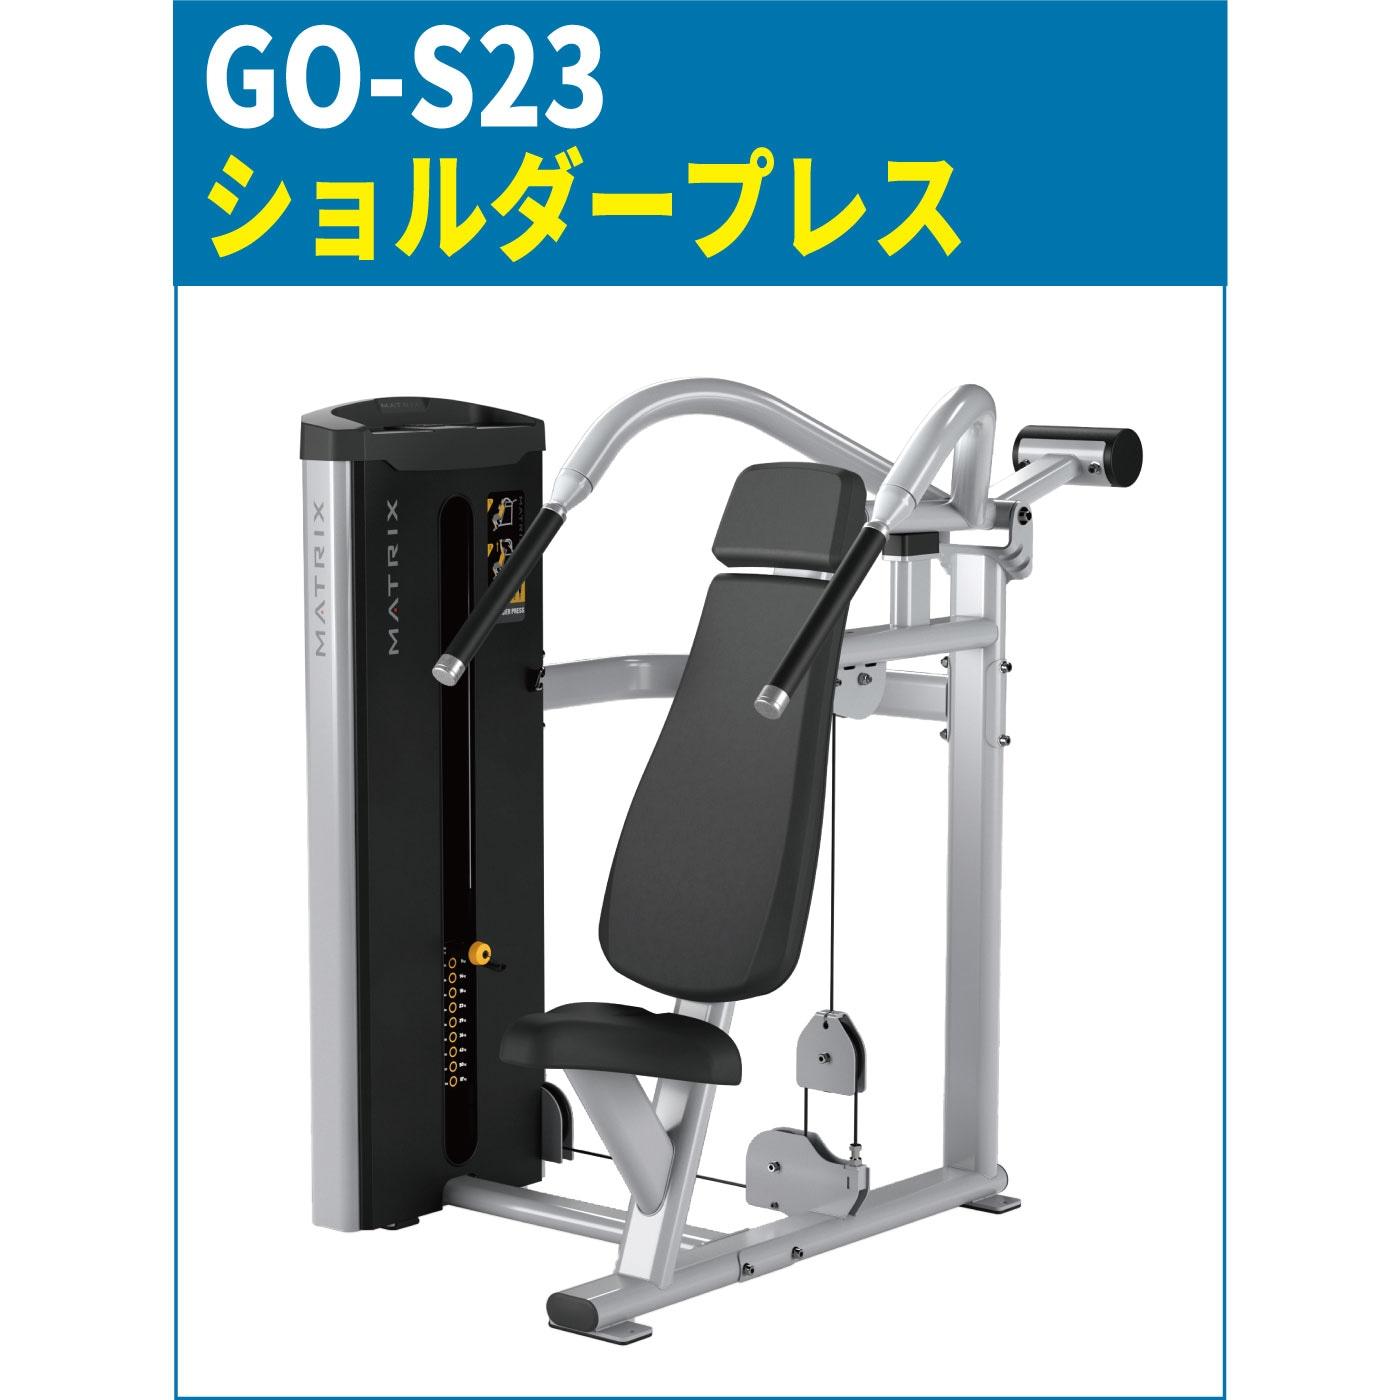 GO-S23のショルダープレス